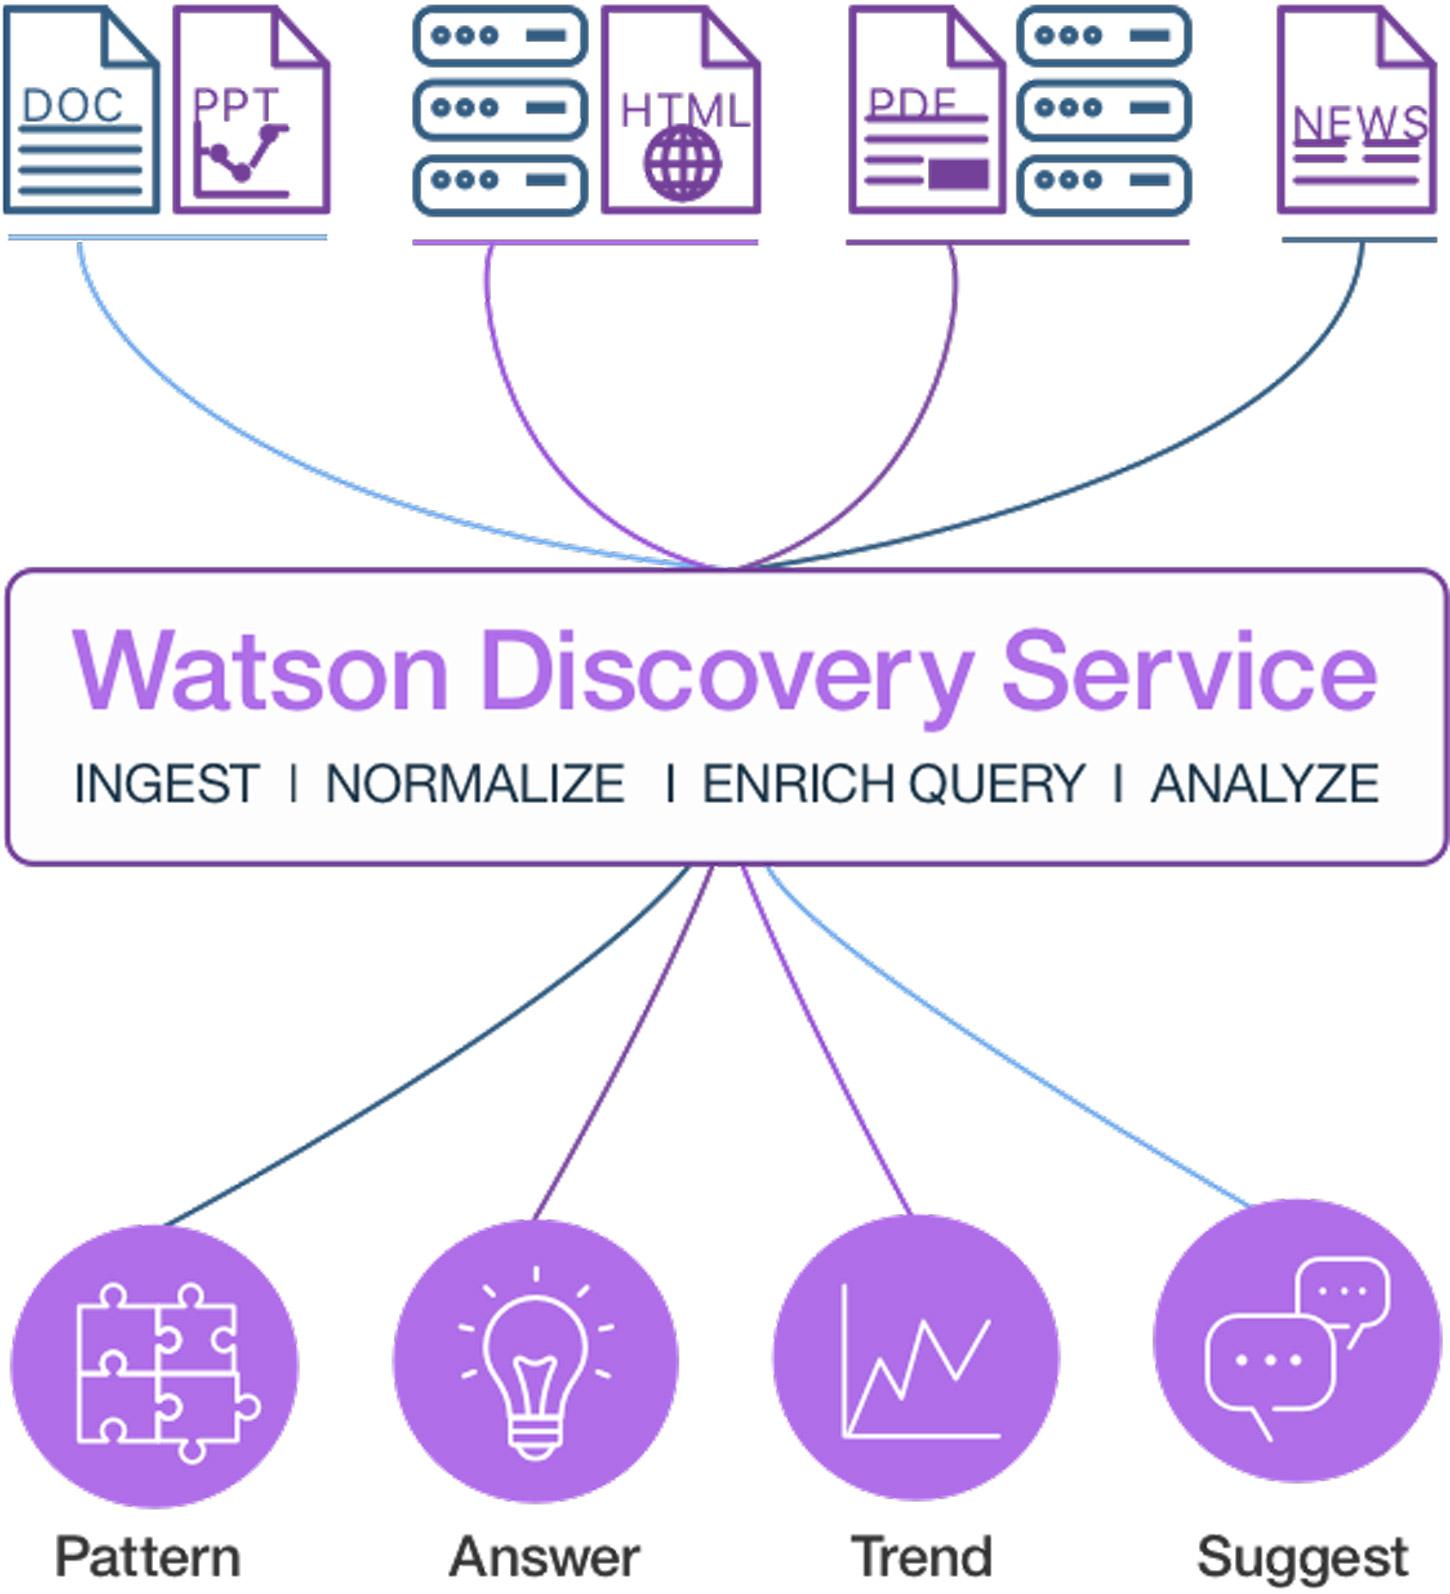 IBM Watson Discovery Product Screenshot 1 DataEthics4All AI Society